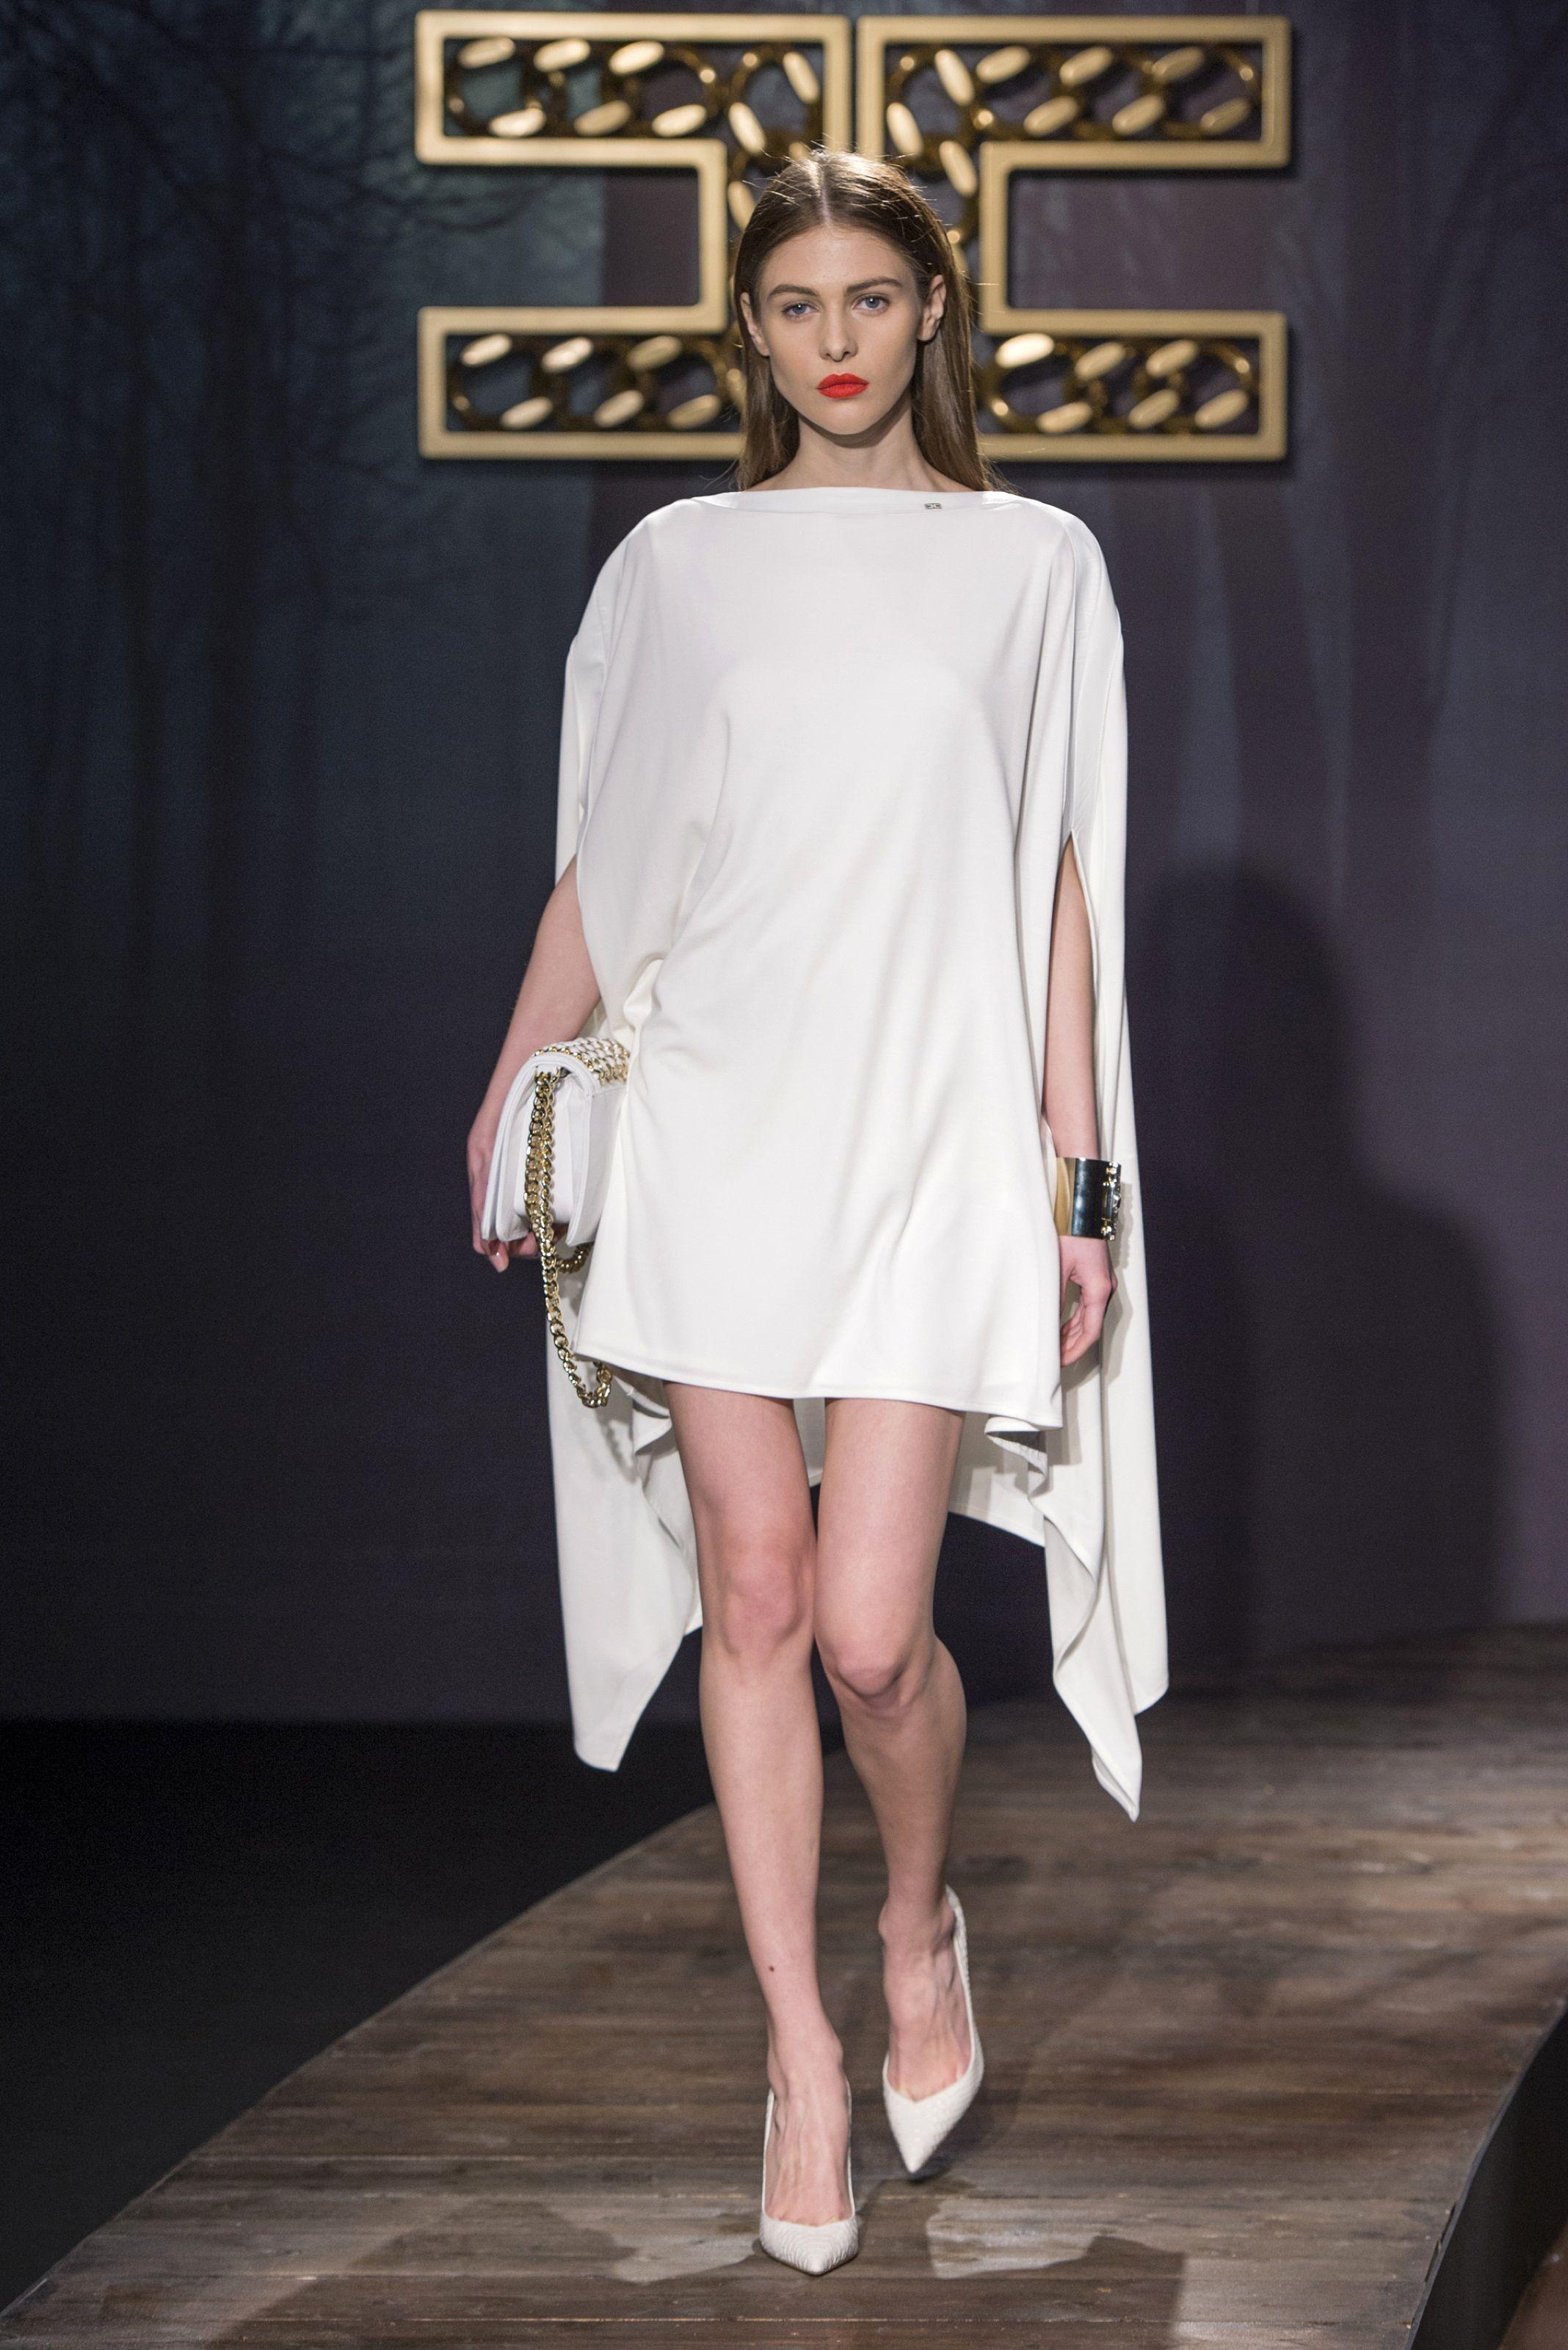 b071acf7af87 Sfilata Elisabetta Franchi Milano - Collezioni Autunno Inverno 2014-15 -  Vogue